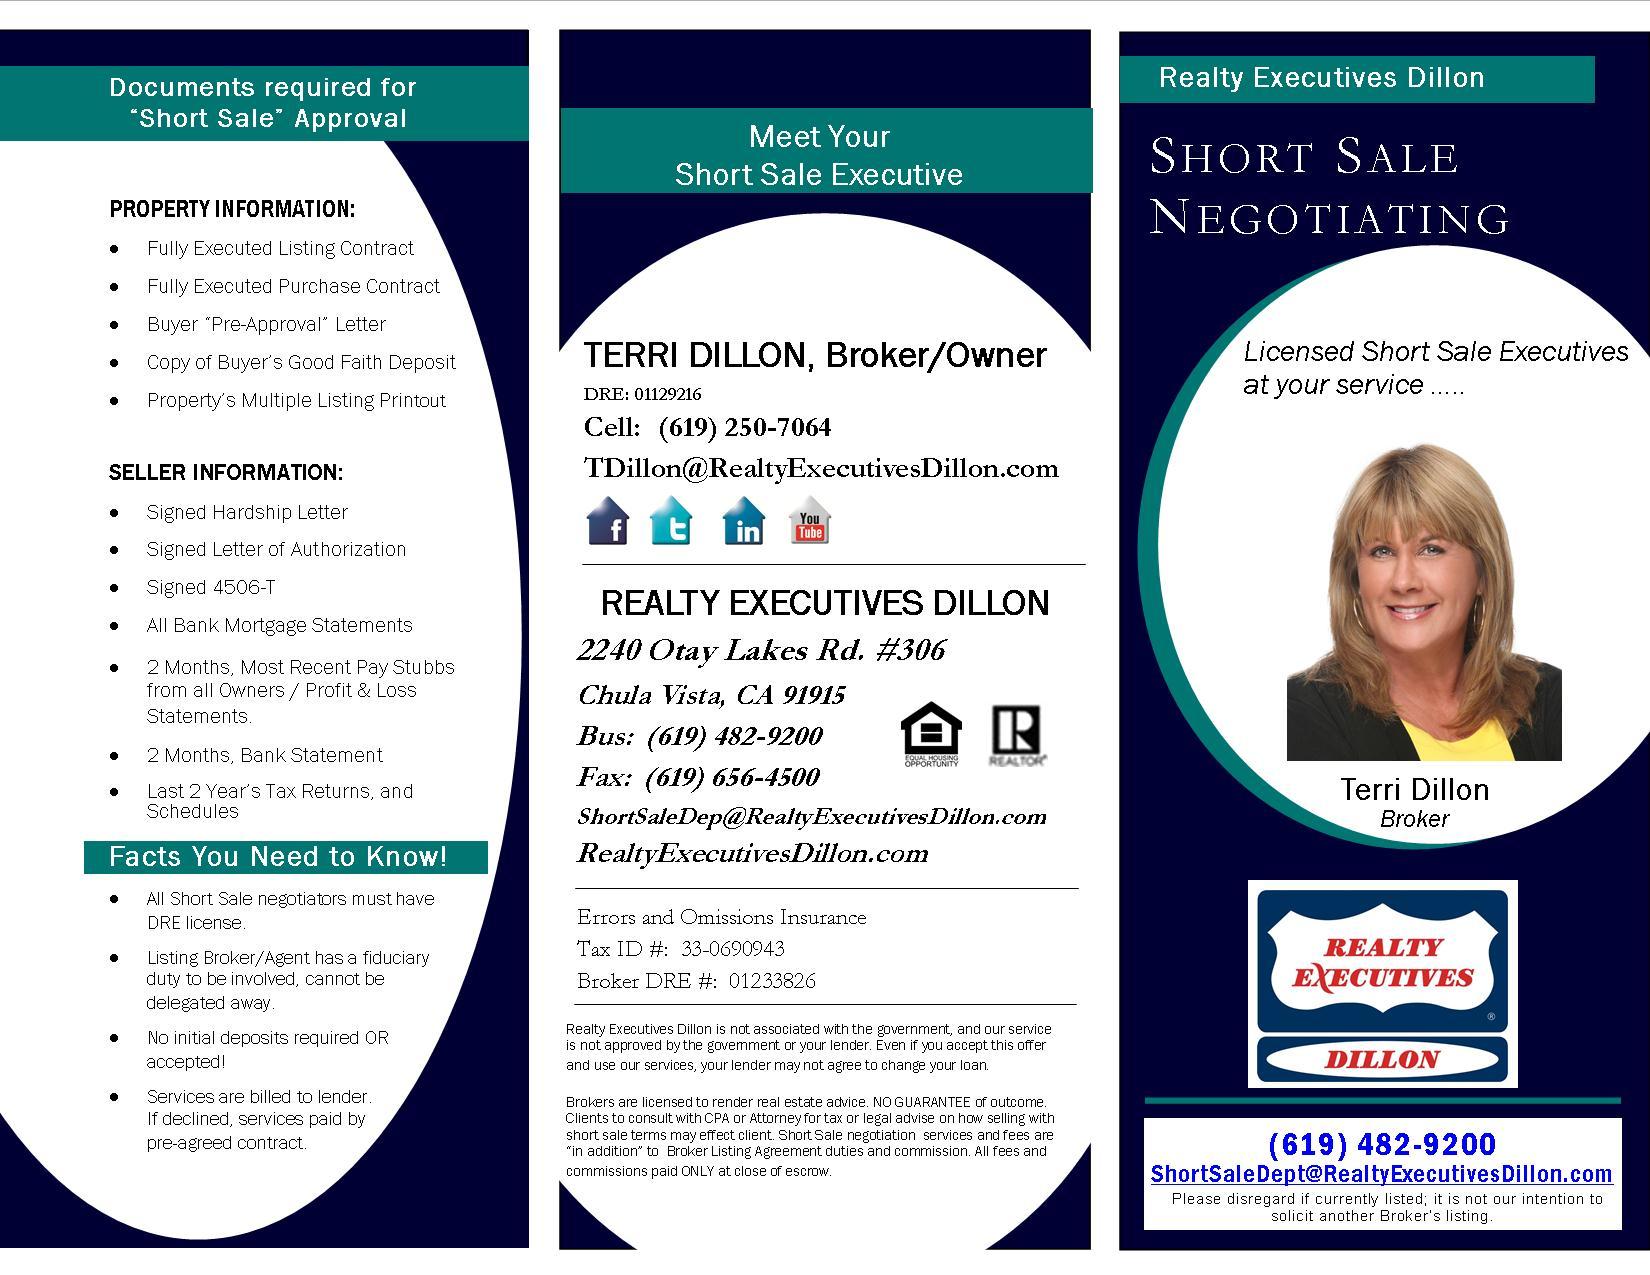 Short Sale Brochure Lower Case Media